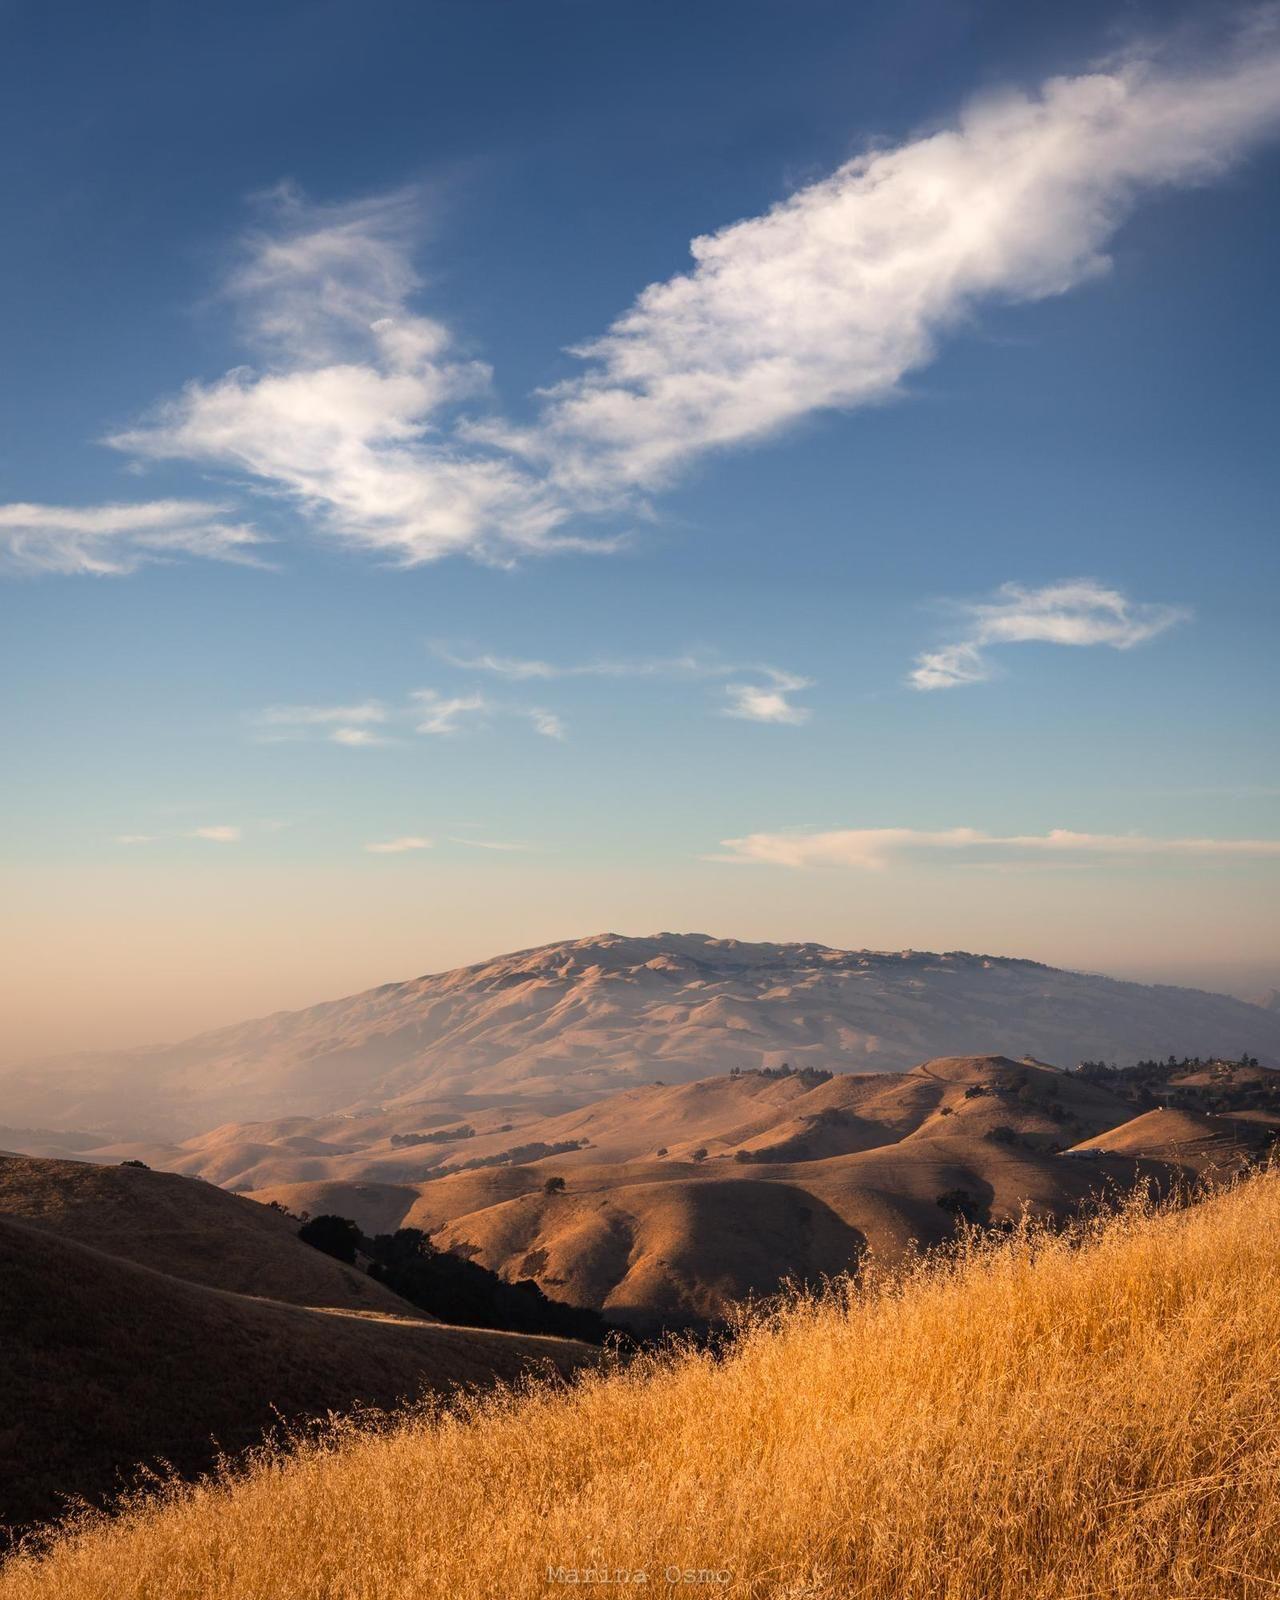 Pin By Michael Barrett On San Jose Express Landscape Photography Nature San Jose California Landscape Photography